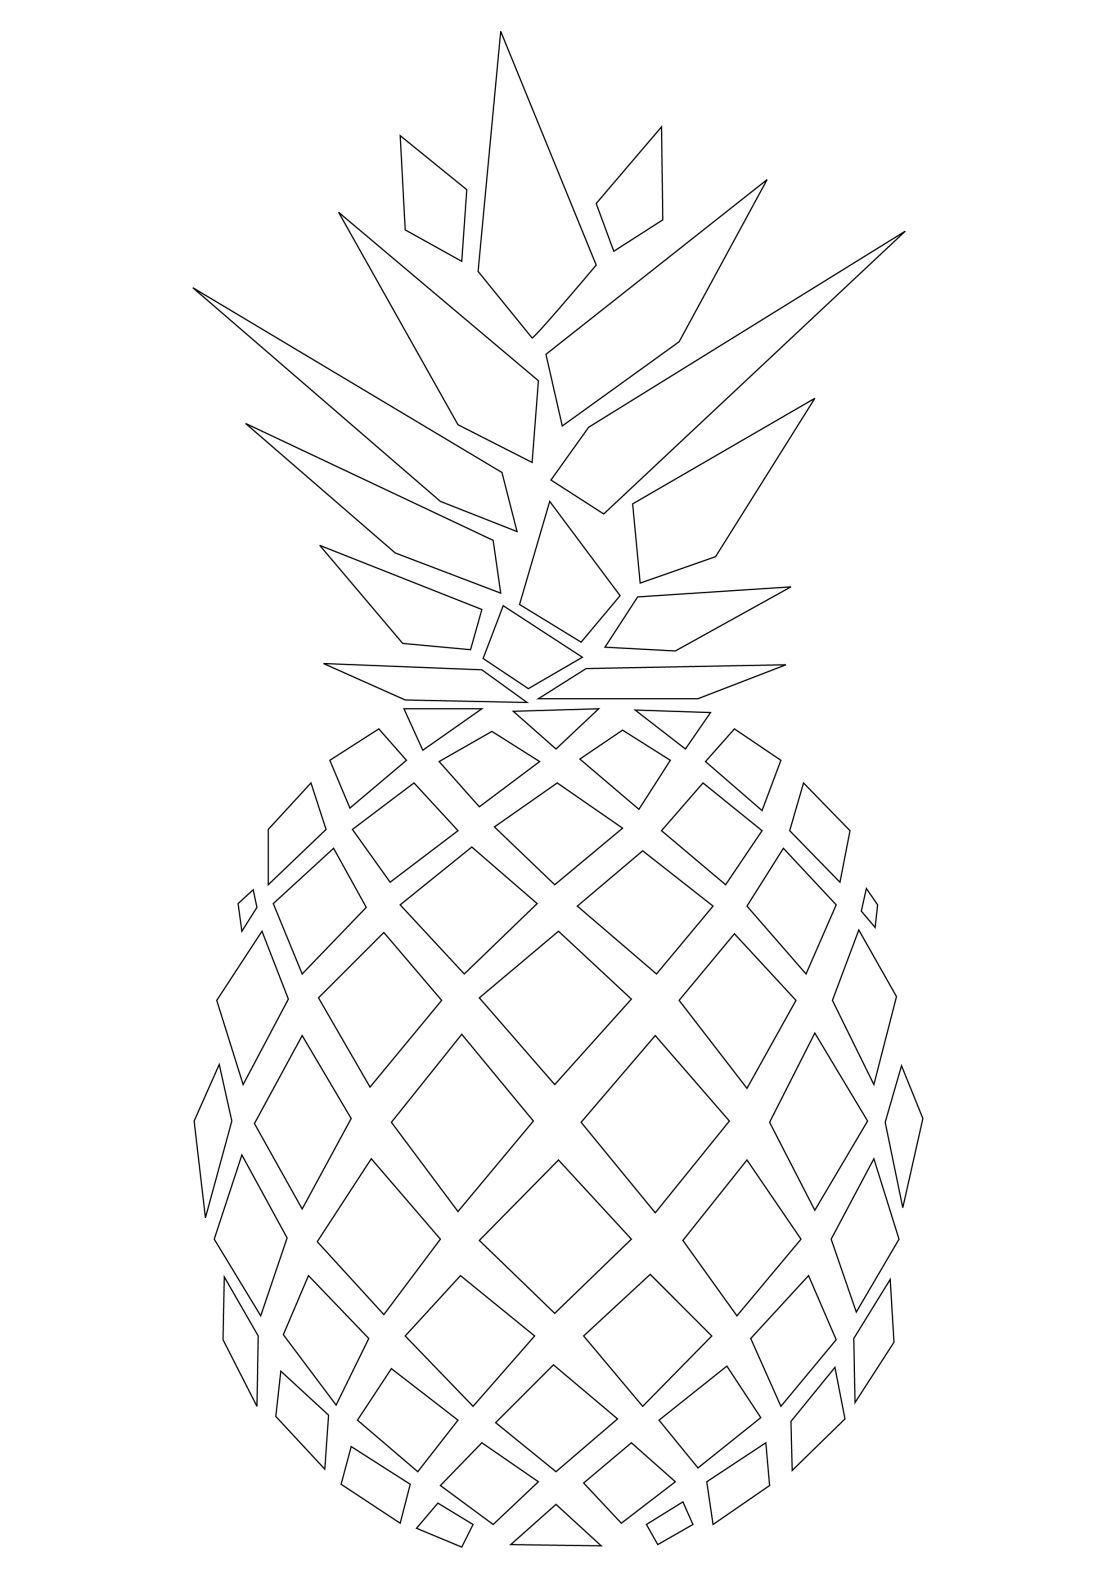 16 Ananas DIY-Ideen  ananas, ananas kunst, heimwerken und